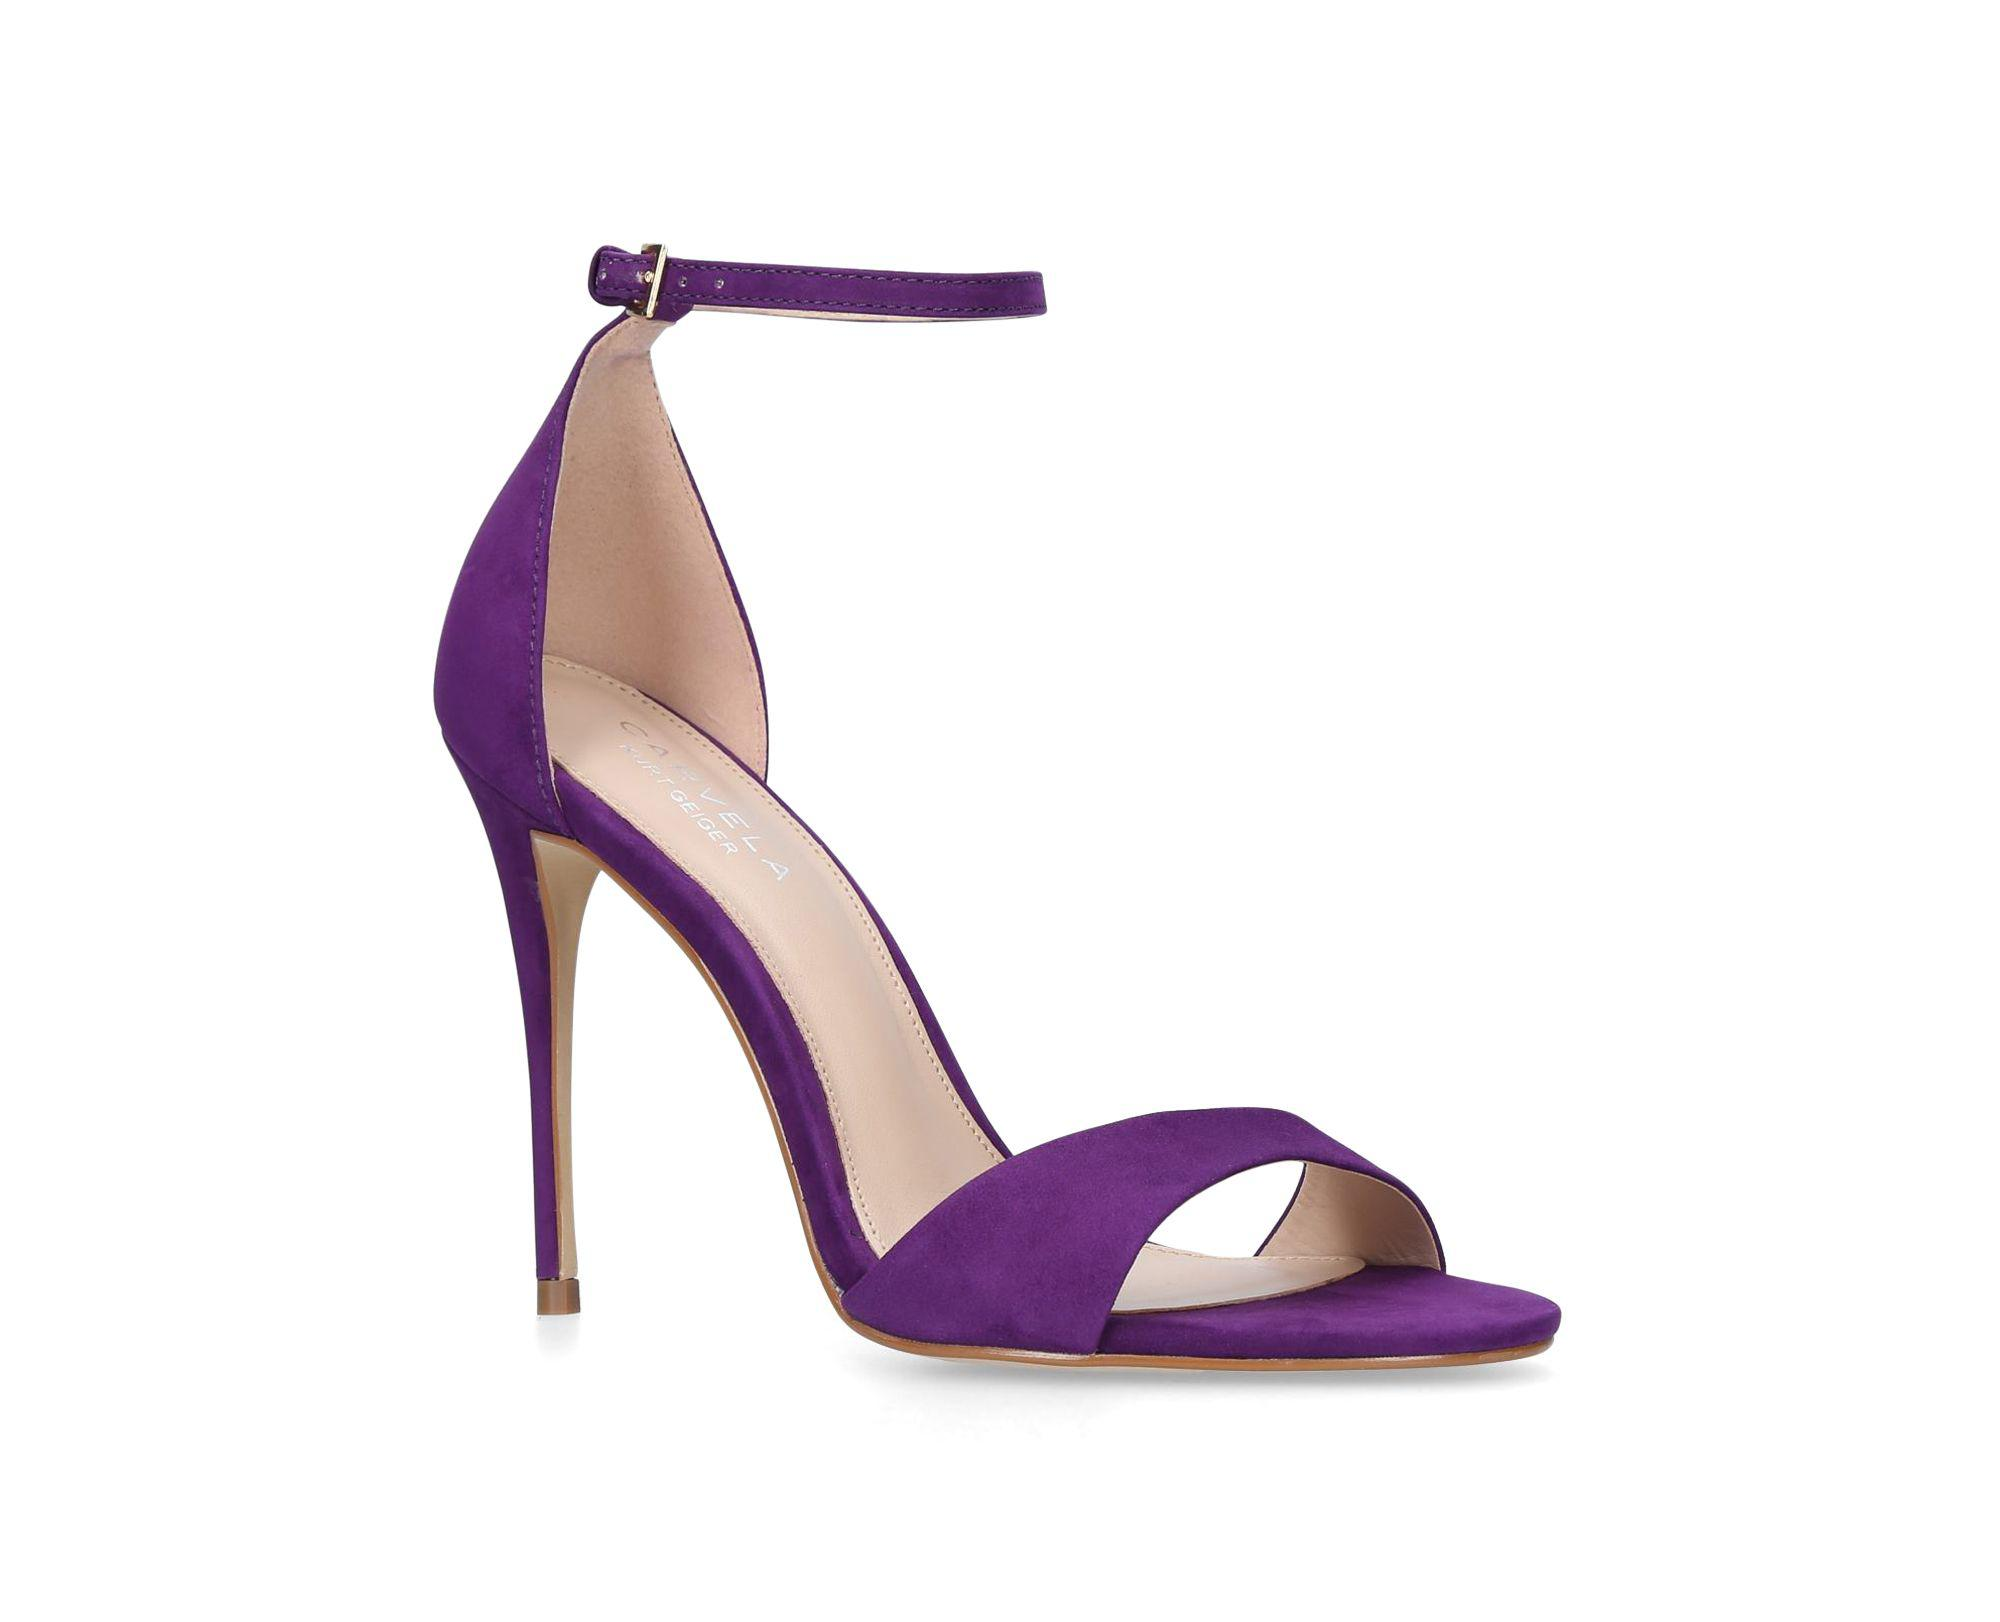 74ce5578628 Carvela Kurt Geiger Purple  glimmer  High Heel Sandals in Purple - Lyst